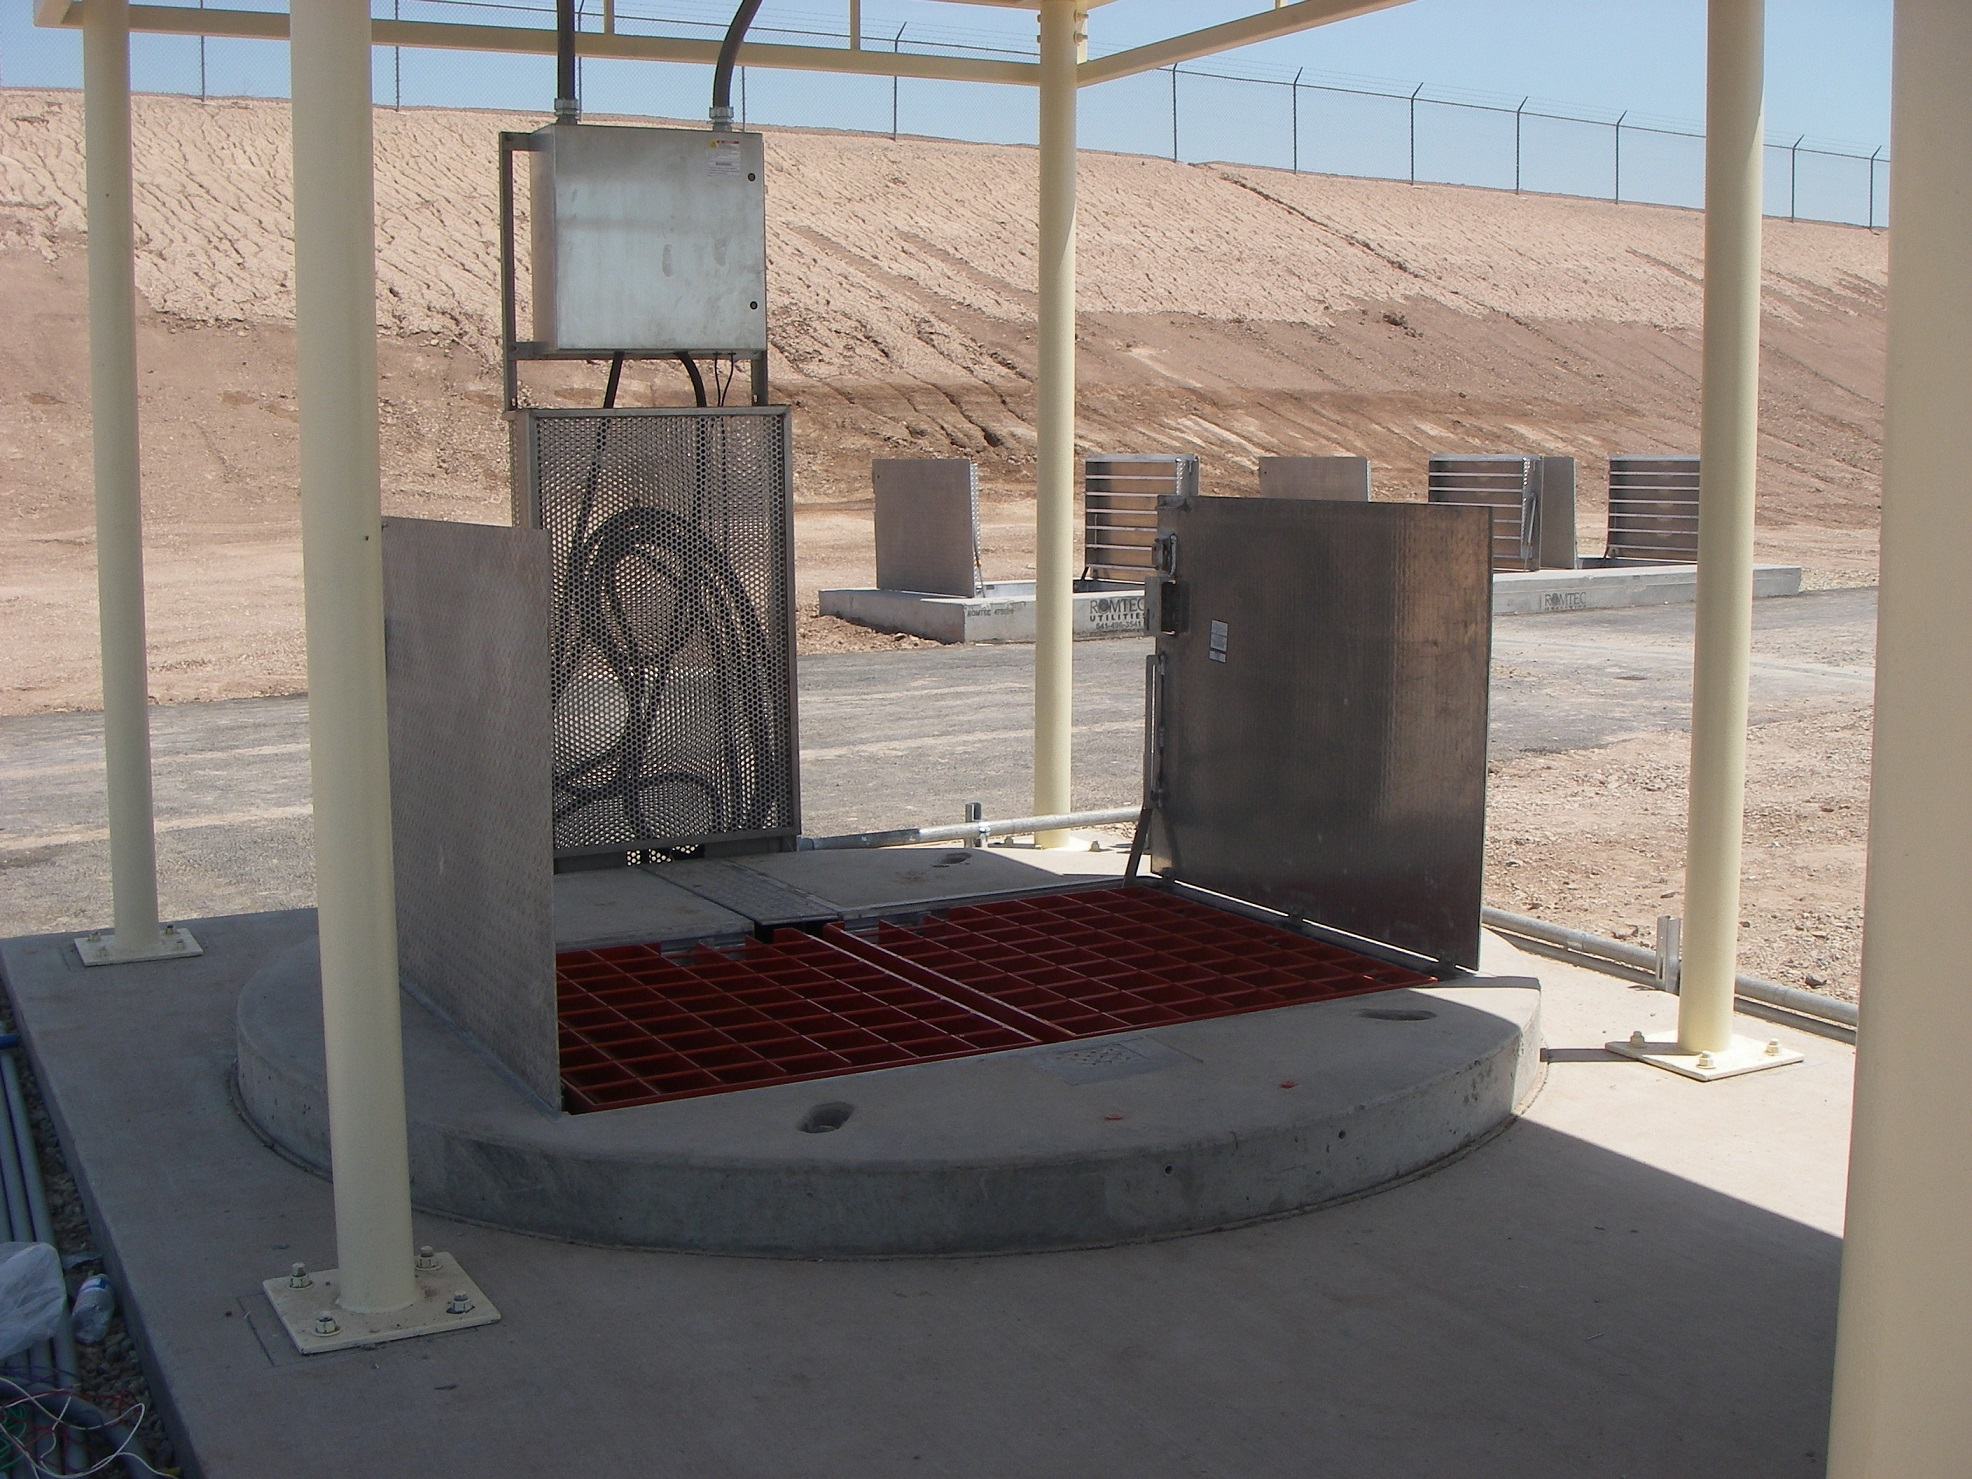 Sheltered Pump Manhole